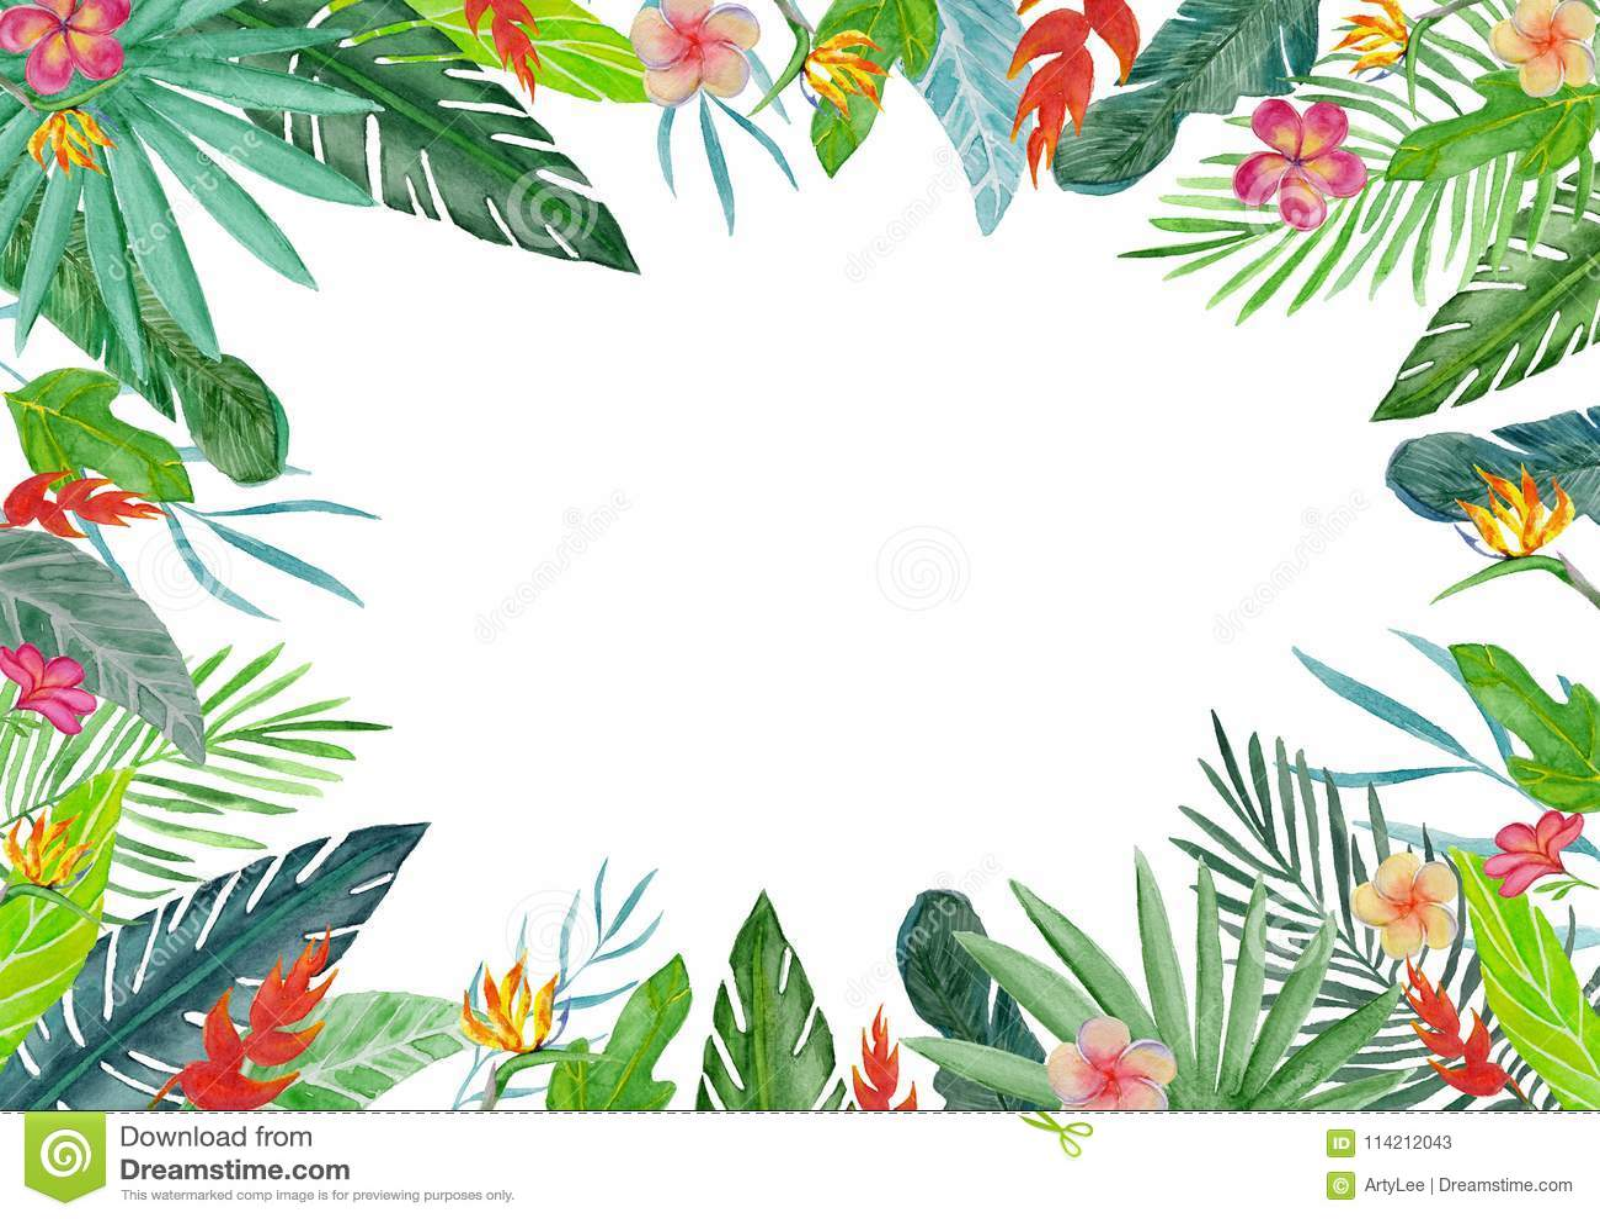 Tropical Borders Free